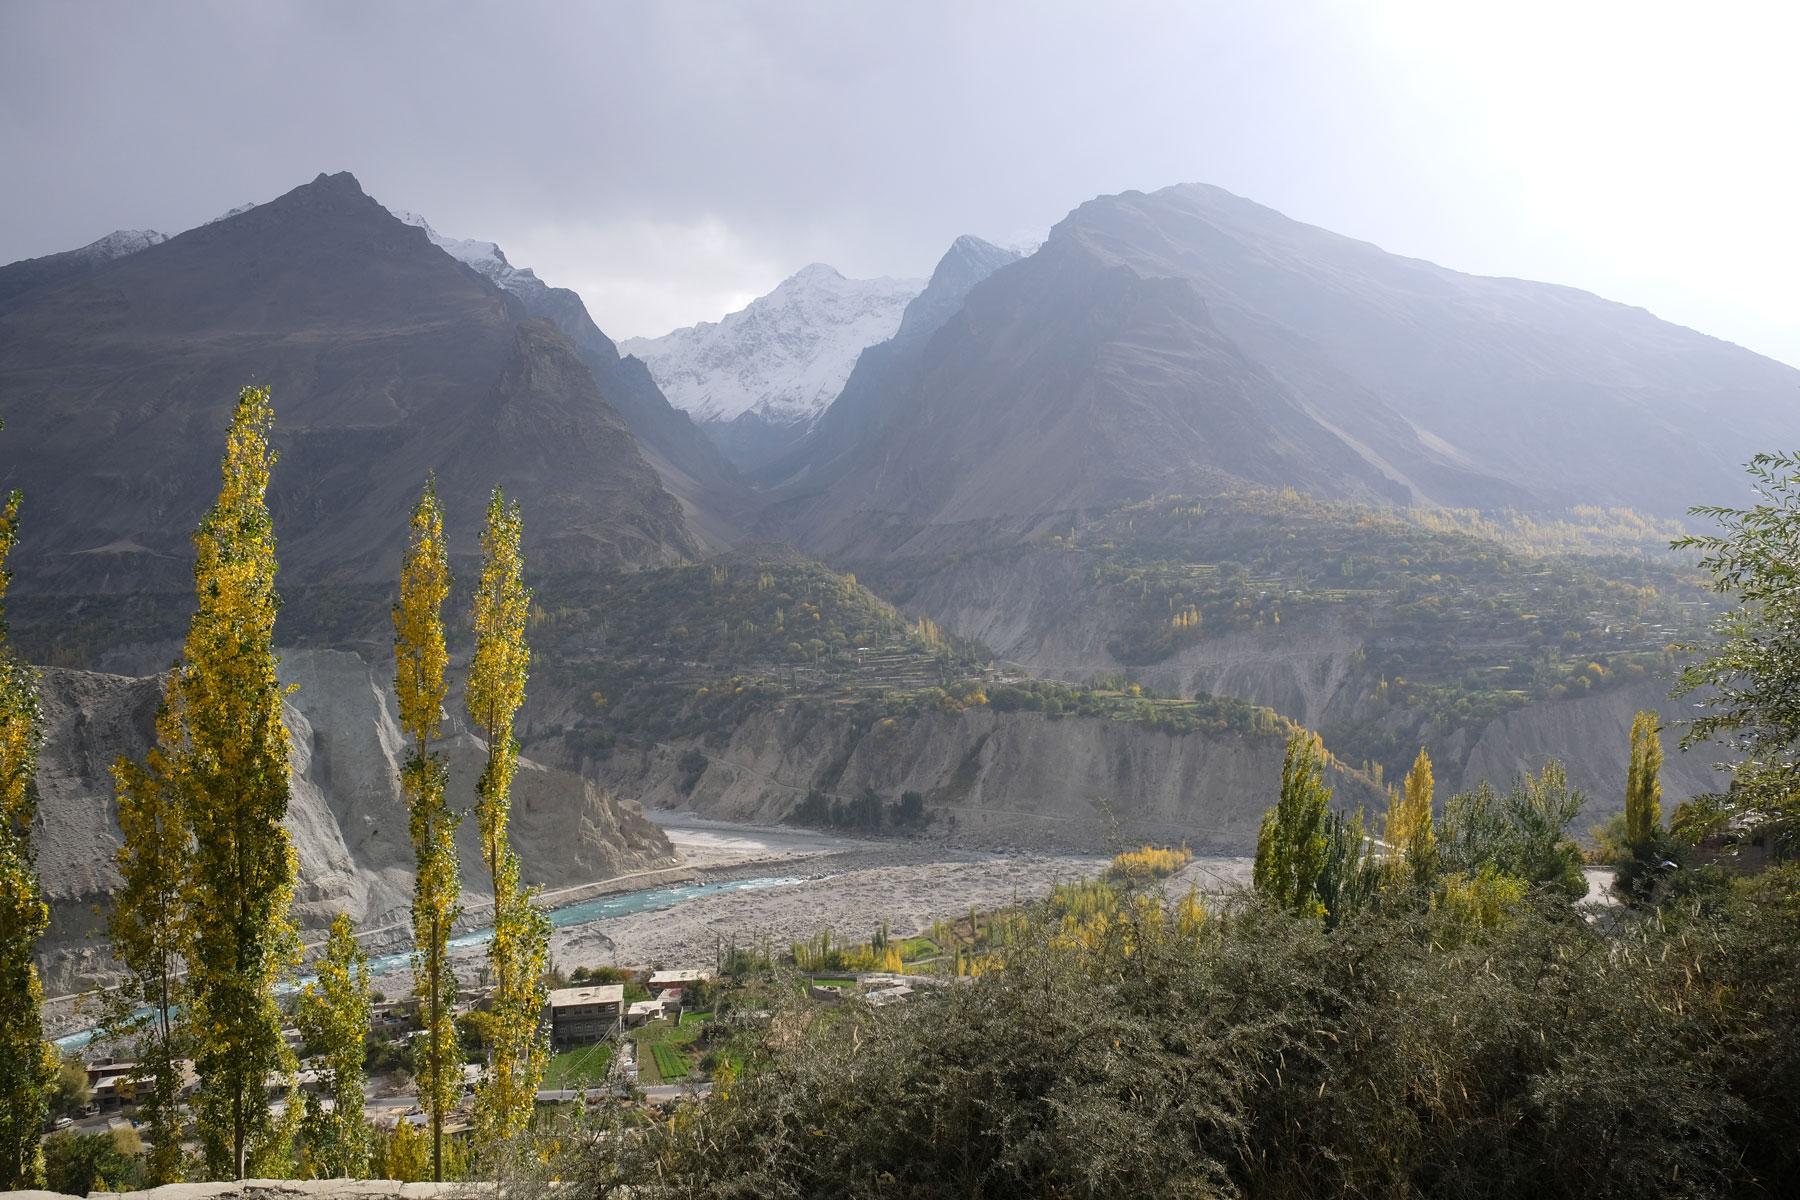 Berge und Bäume im Hunza Tal in Pakistan.